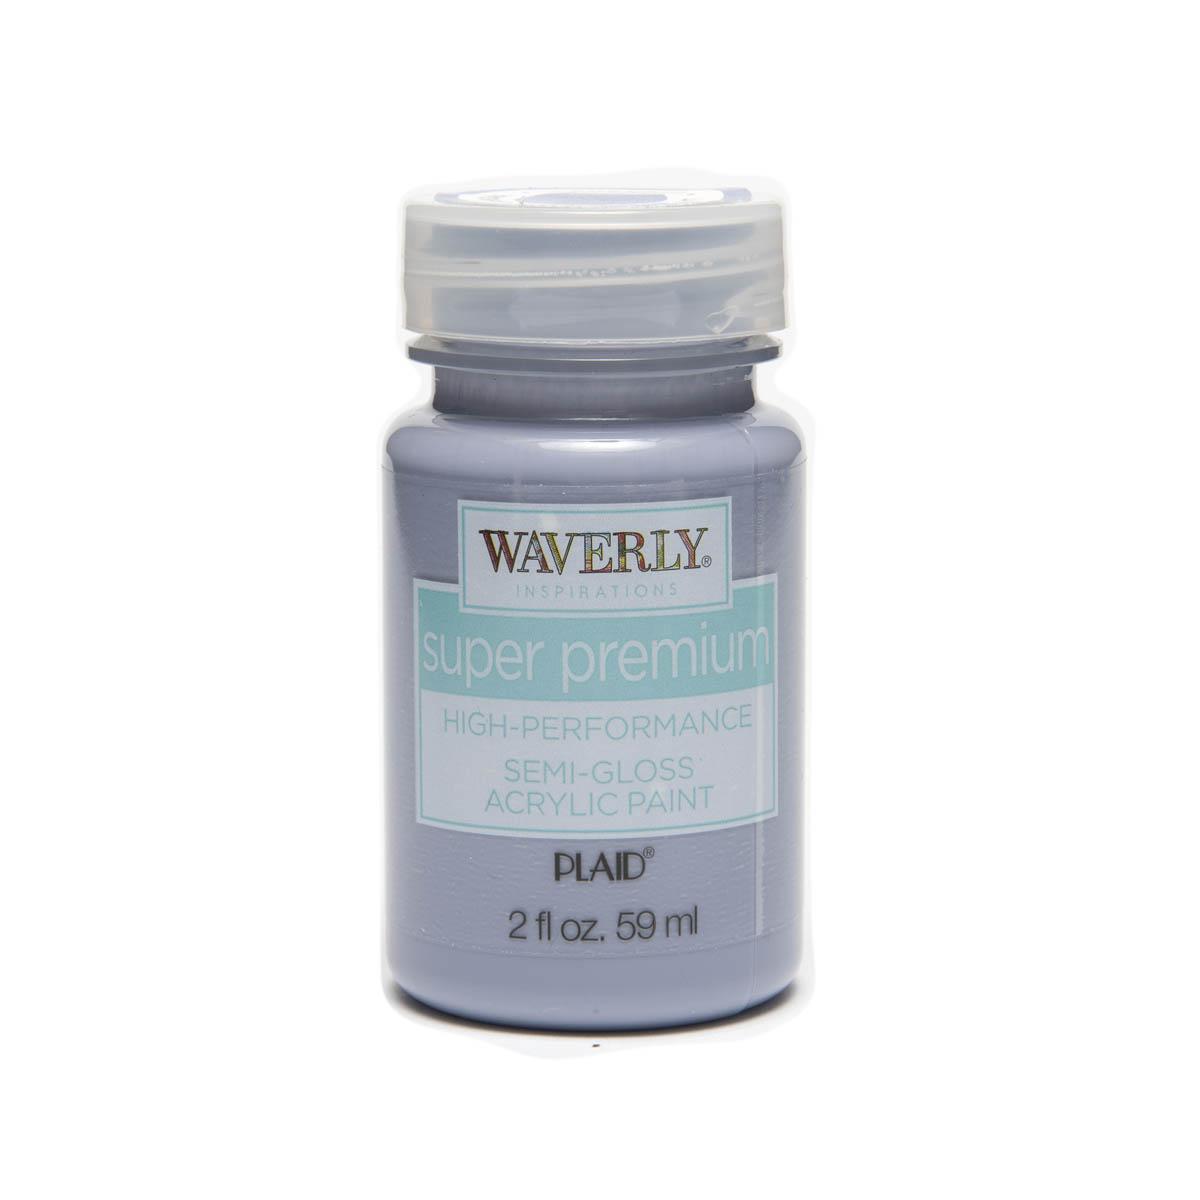 Waverly ® Inspirations Super Premium Semi-Gloss Acrylic Paint - Lavender, 2 oz.